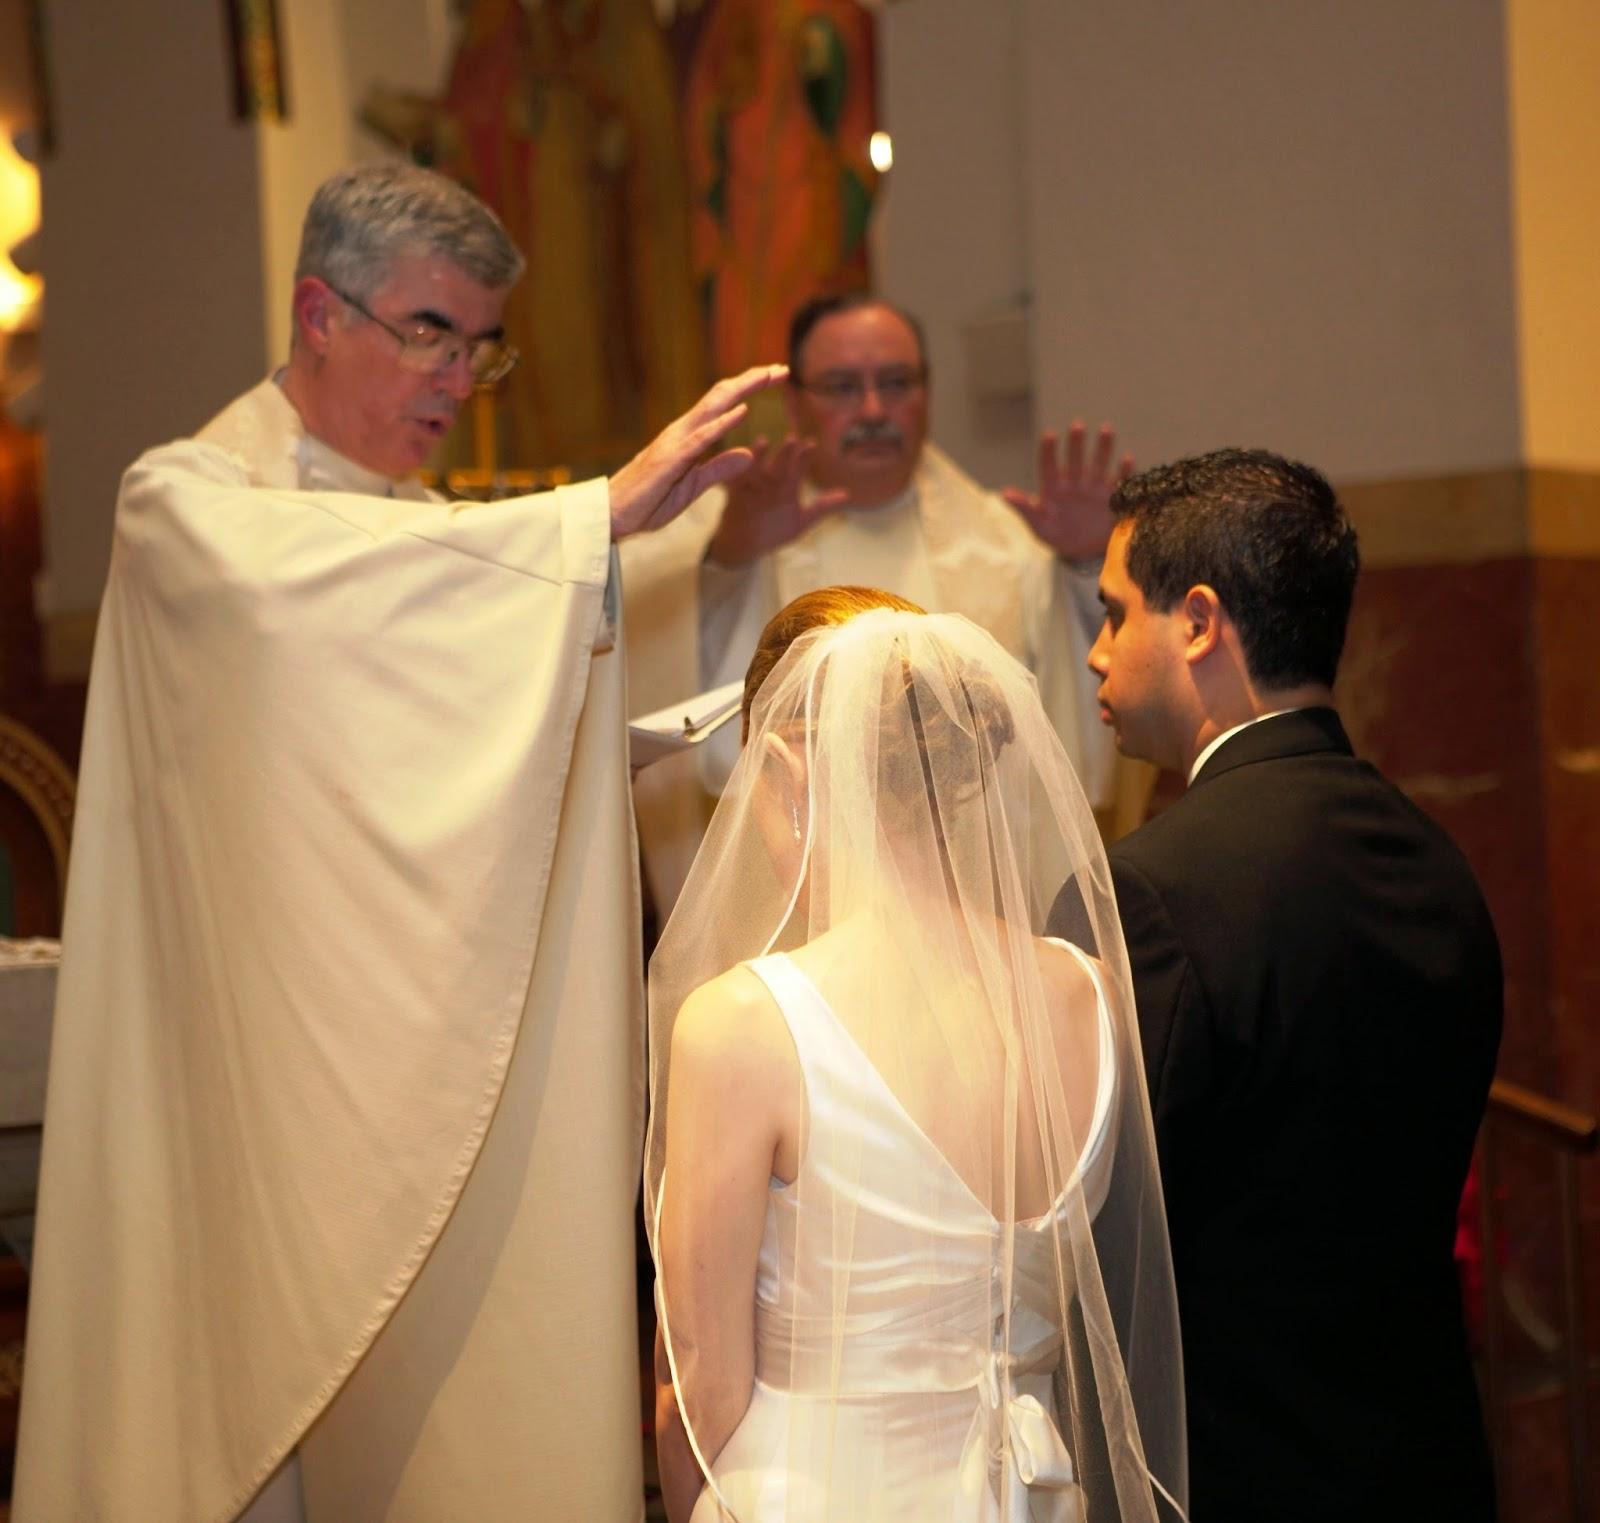 Matrimonio Católico Requisitos : Remar mar adentro el sacramento del matrimonio